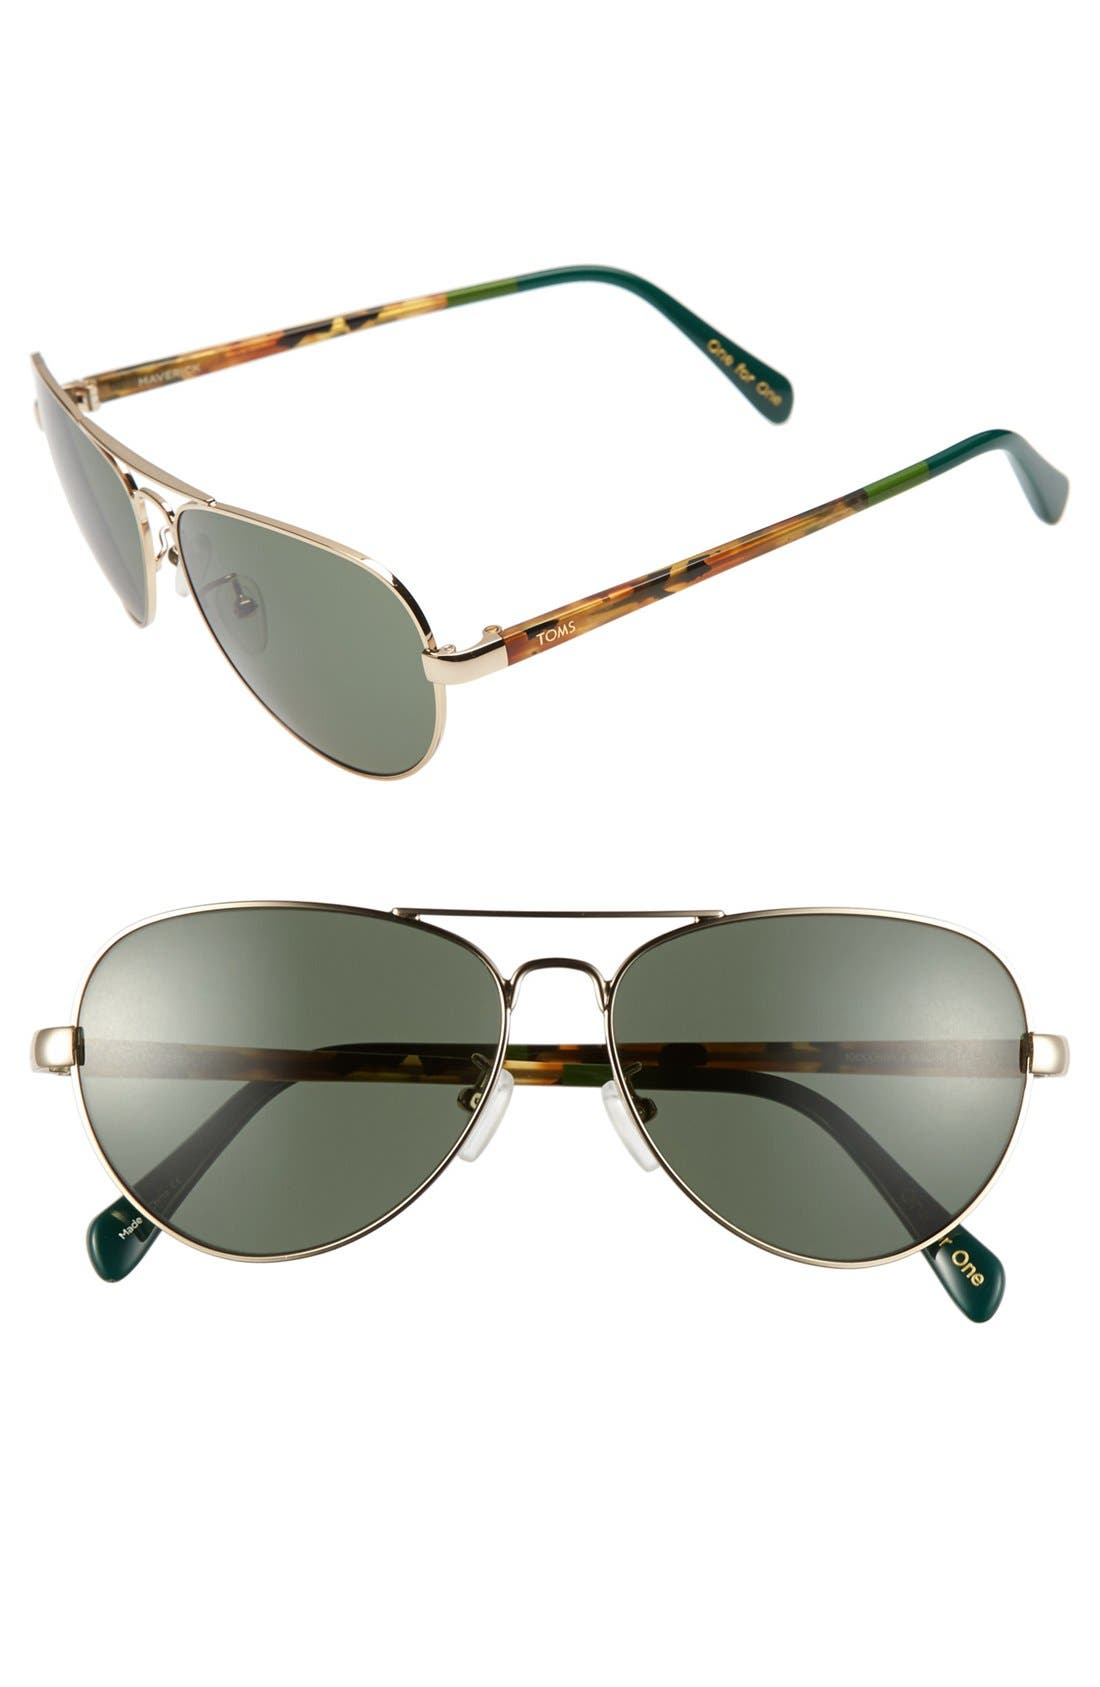 Main Image - TOMS 'Maverick' 59mm Aviator Sunglasses